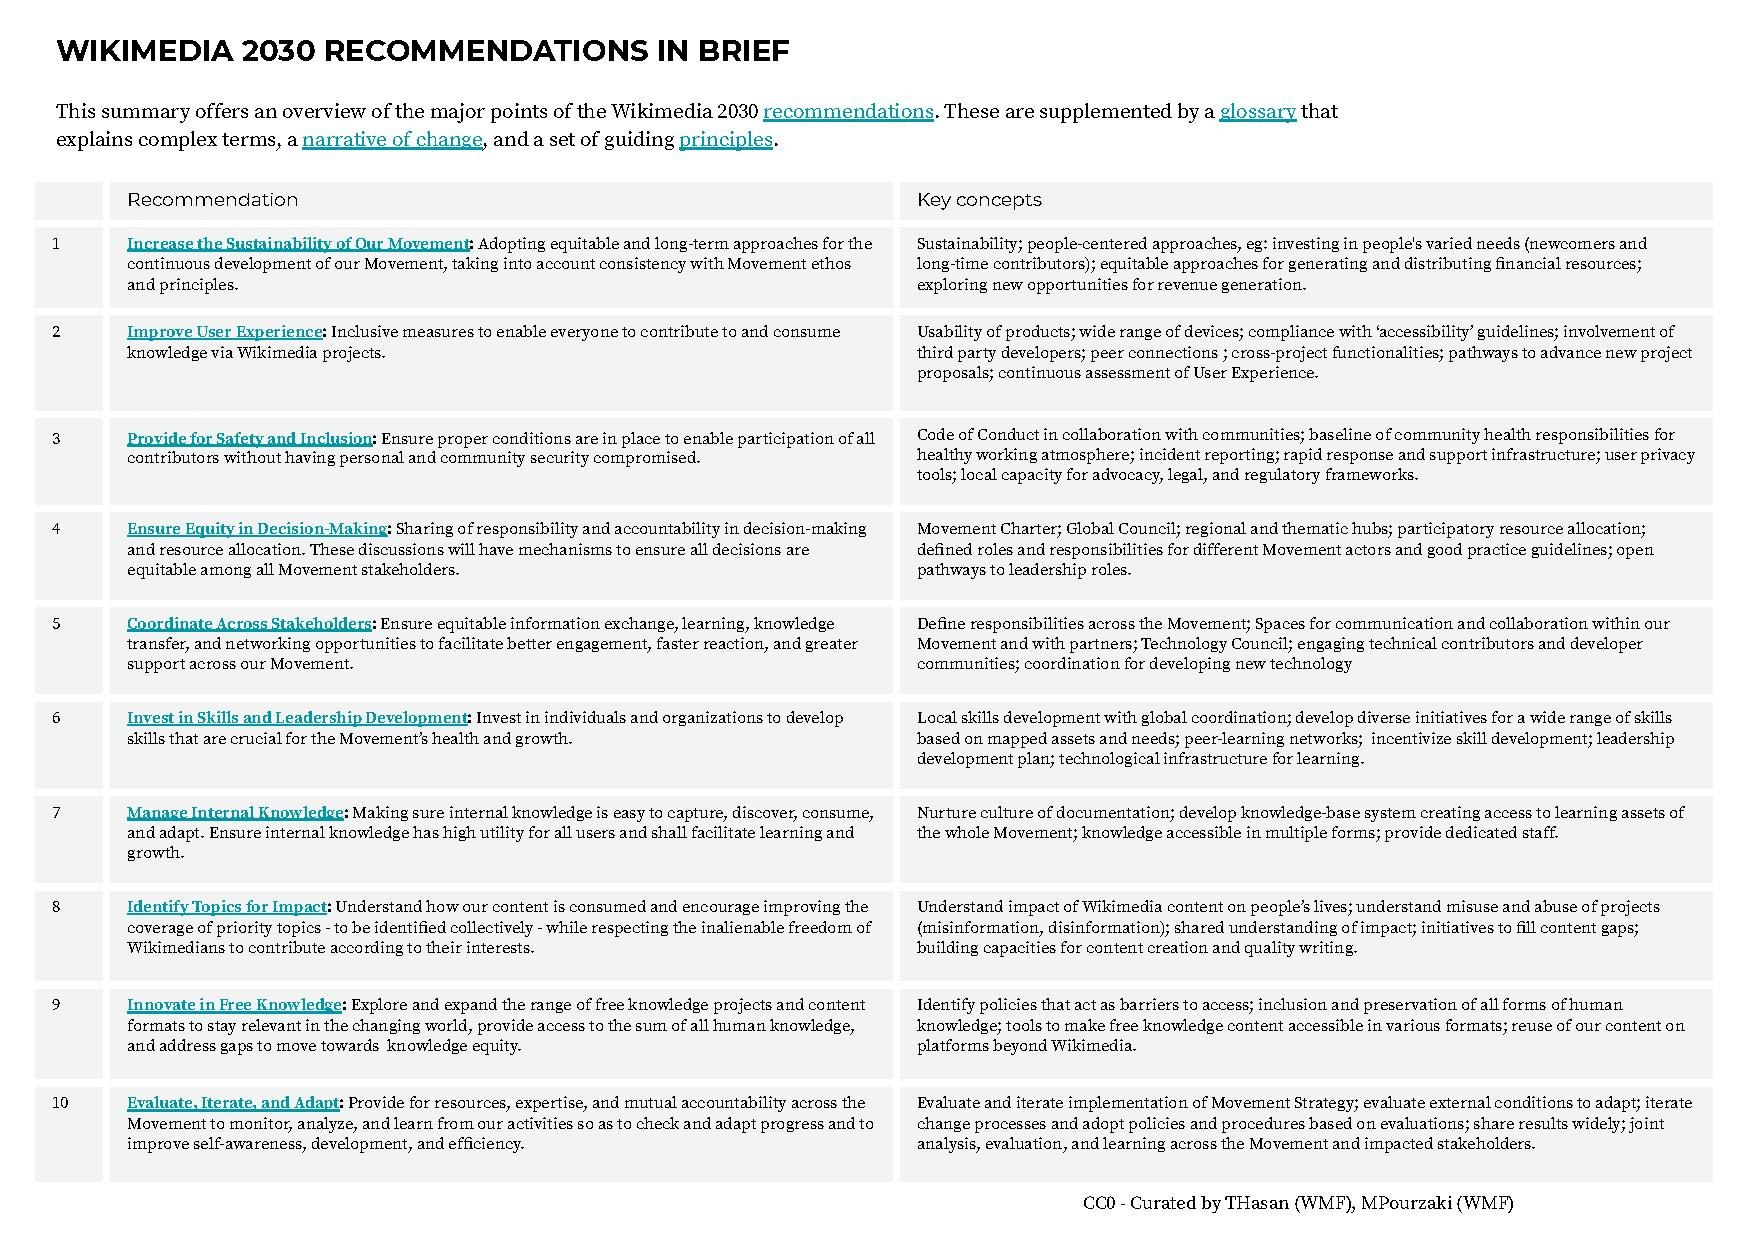 FileWikimedia 9 one page summary.pdf   Meta